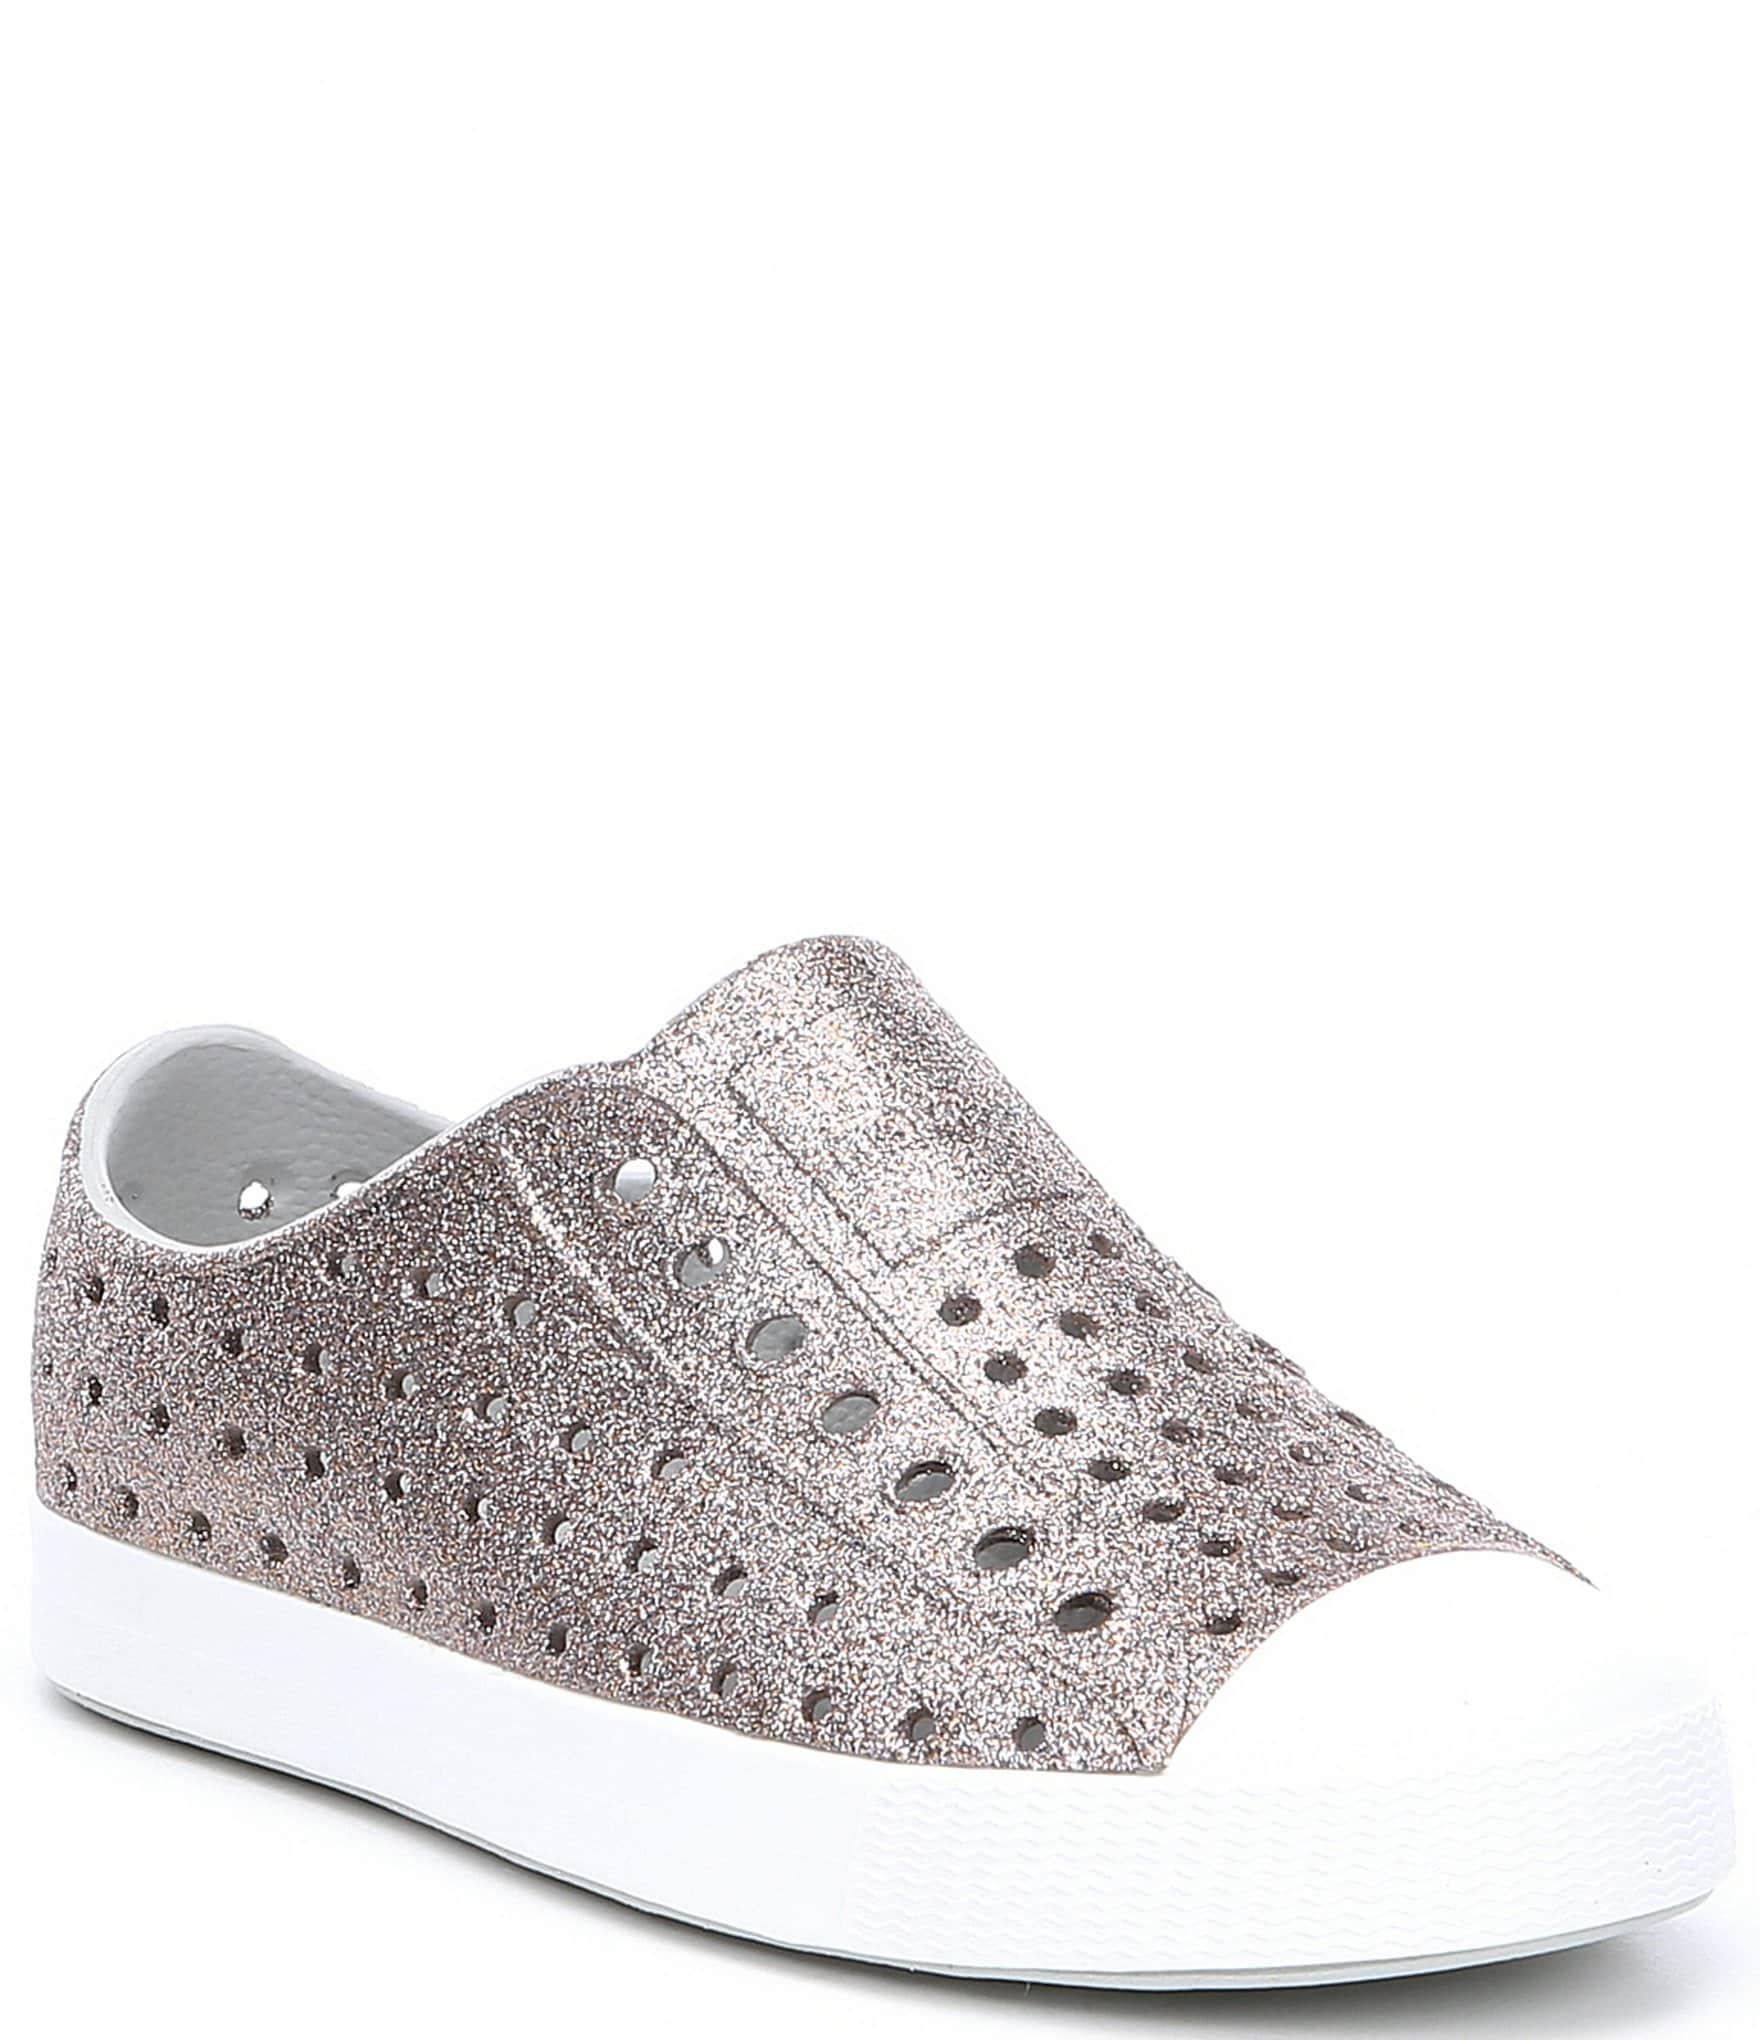 b7a3c7f87e07 Toddler Girls  Slip-On Sneakers